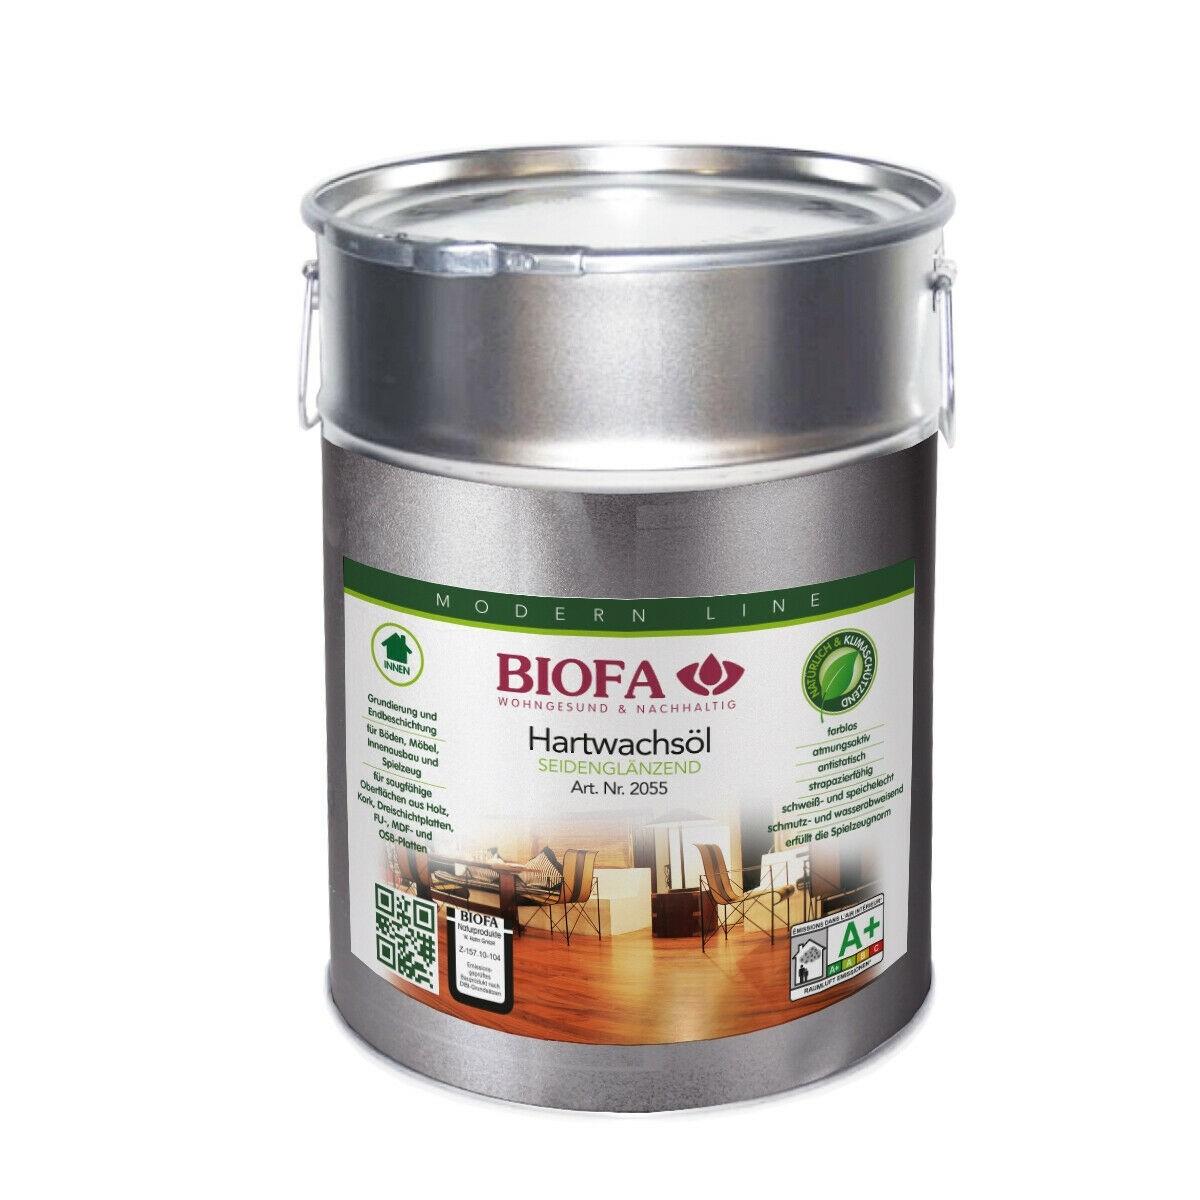 BIOFA Hartwachsöl, seidenglänzend 10 l